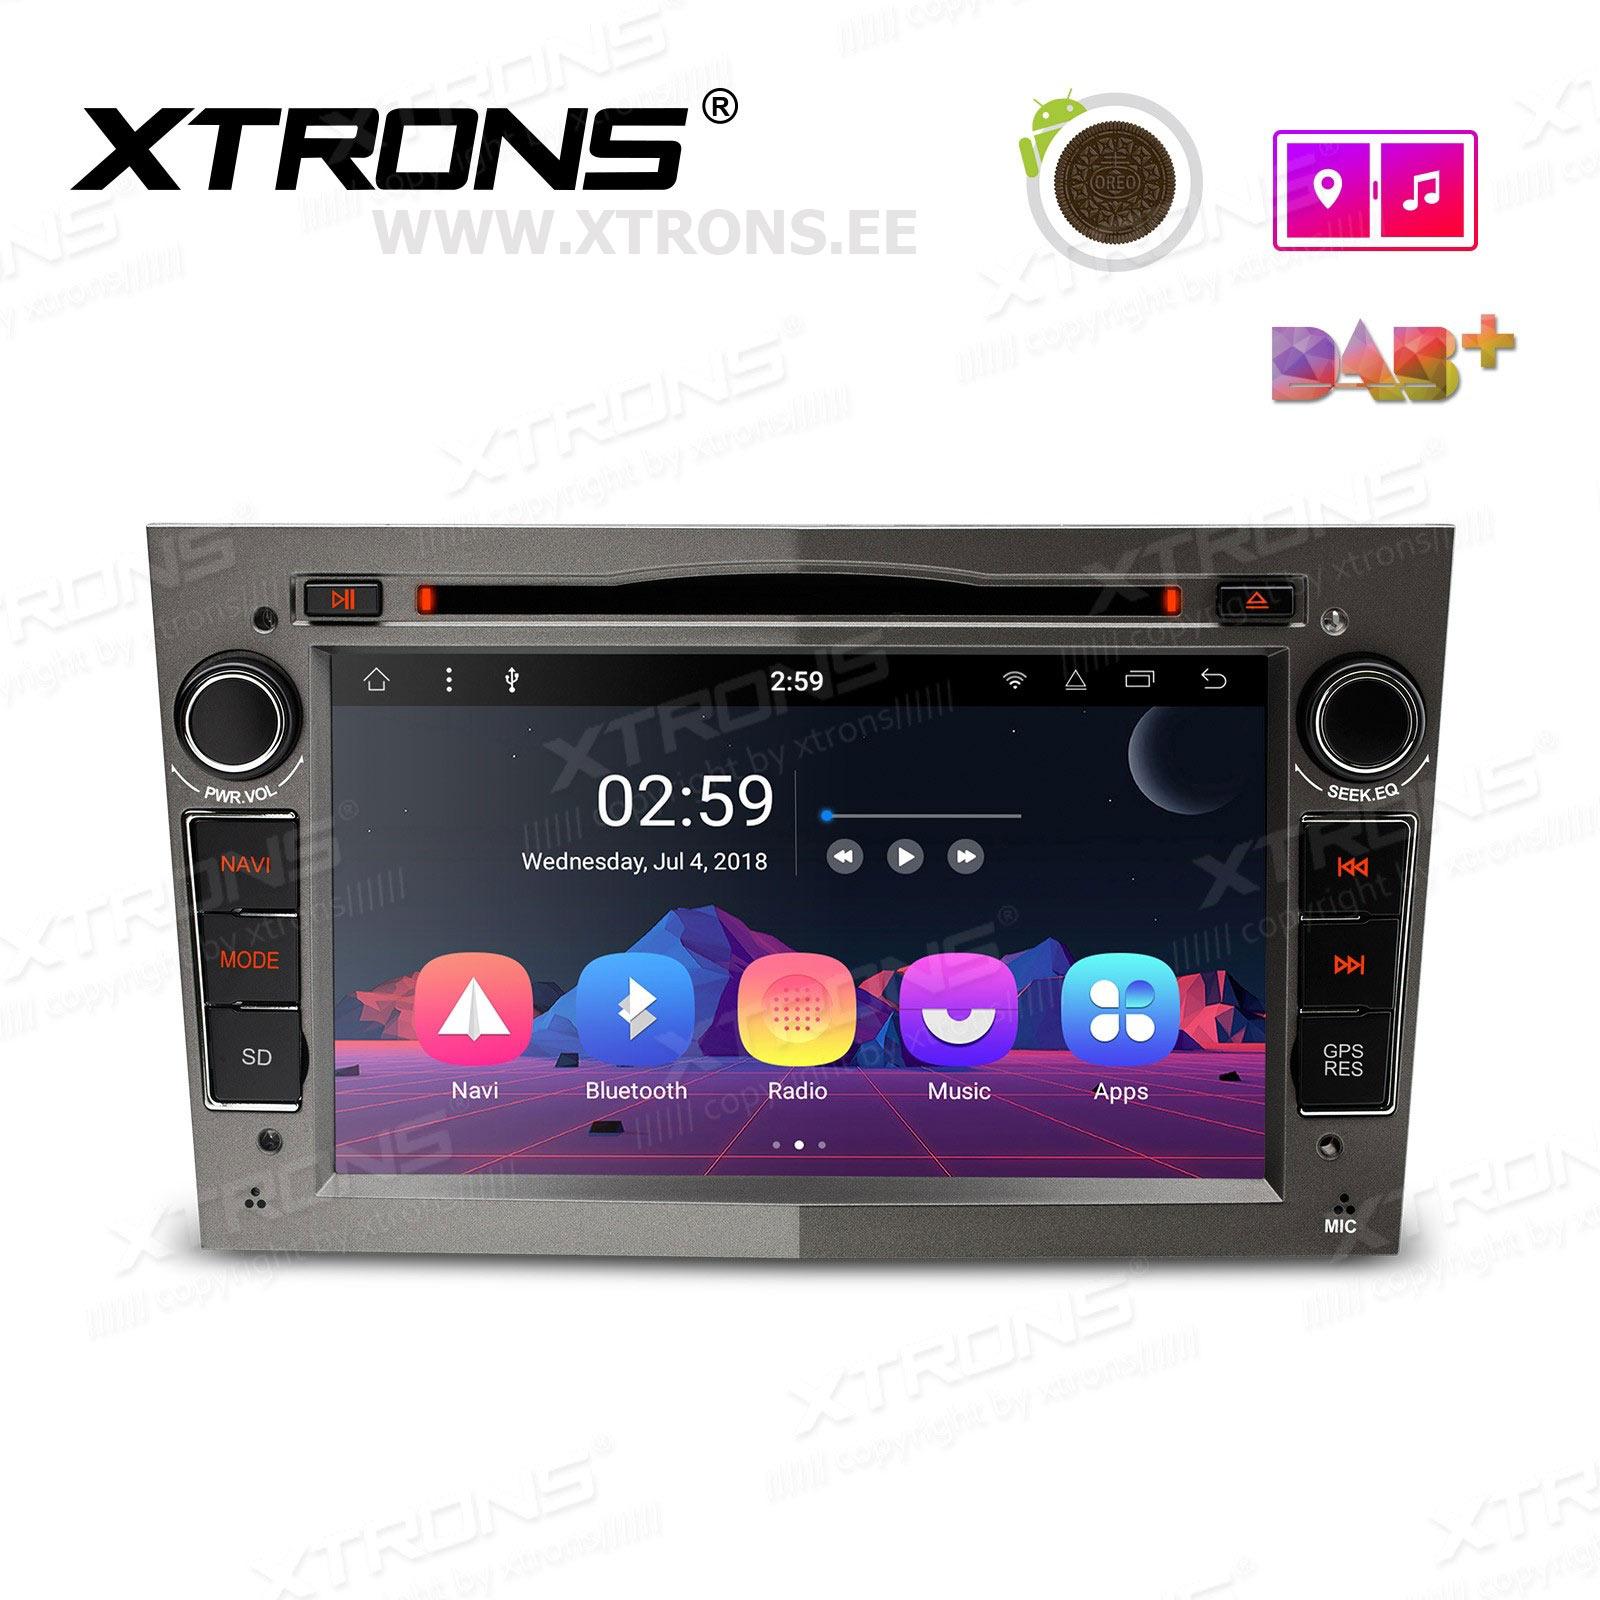 XTRONS PR78OLO-G